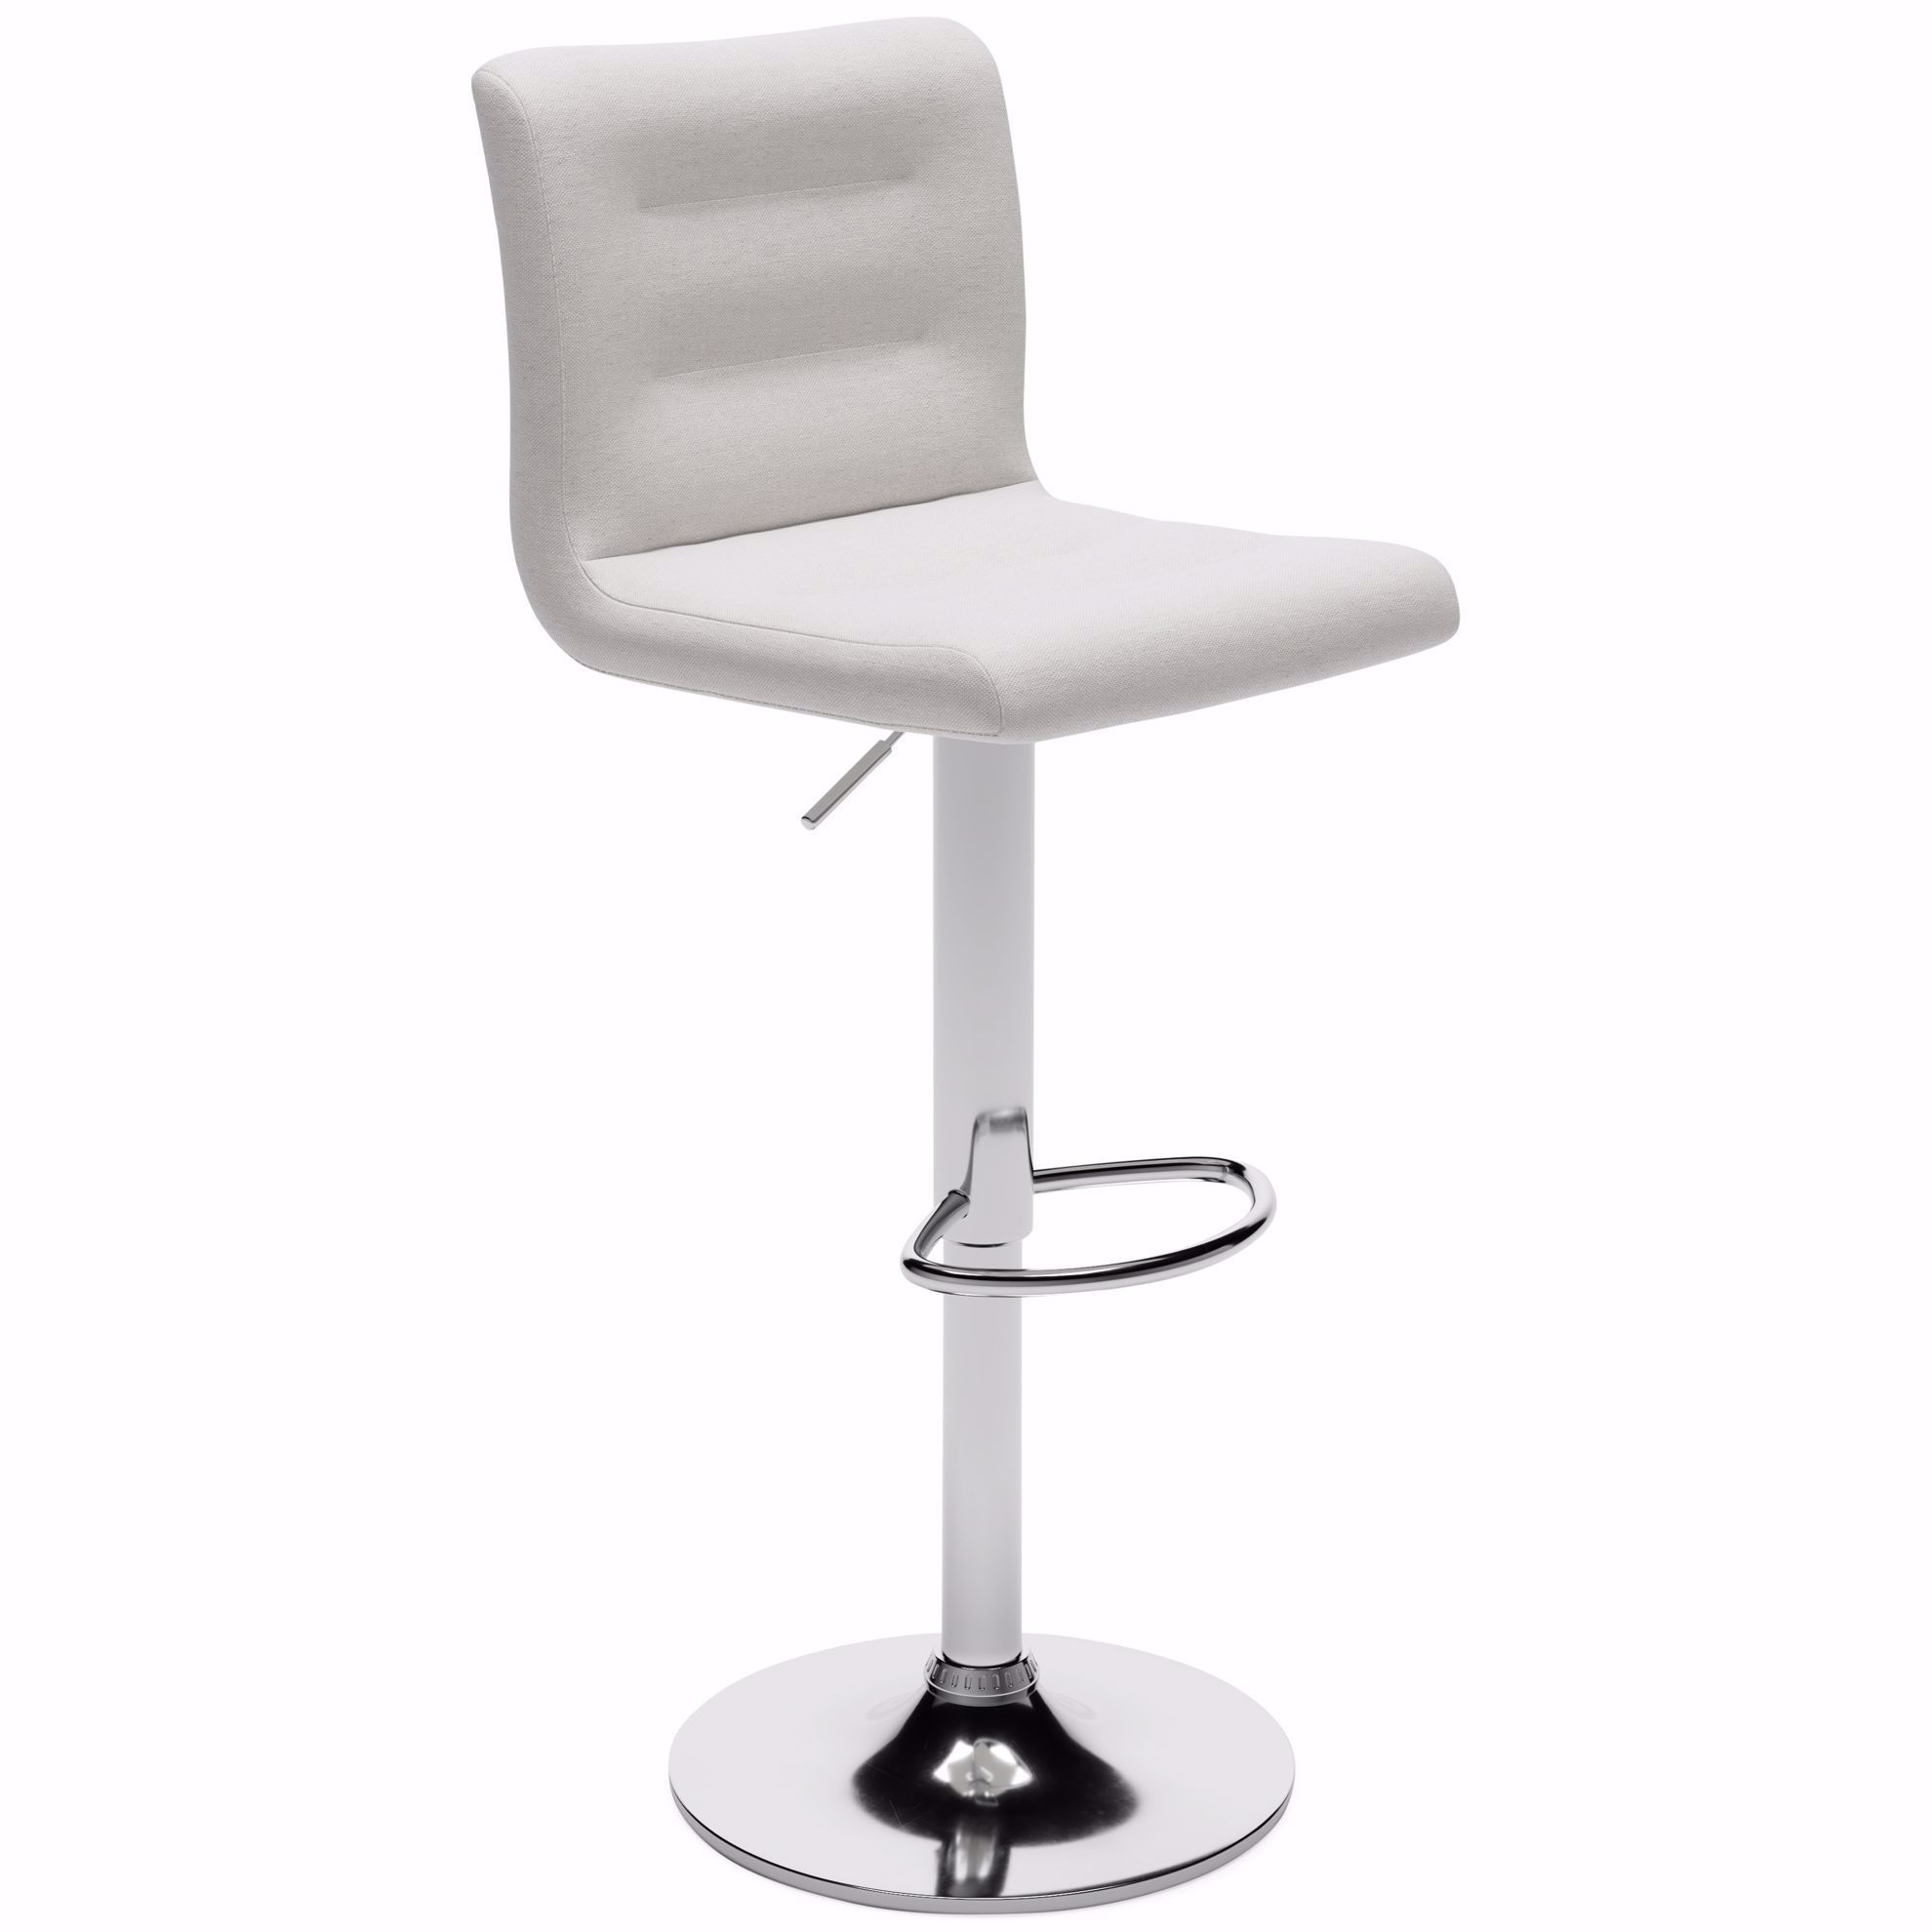 Picture of Pollzen Stone Upholstered Swivel Adjustable Stool